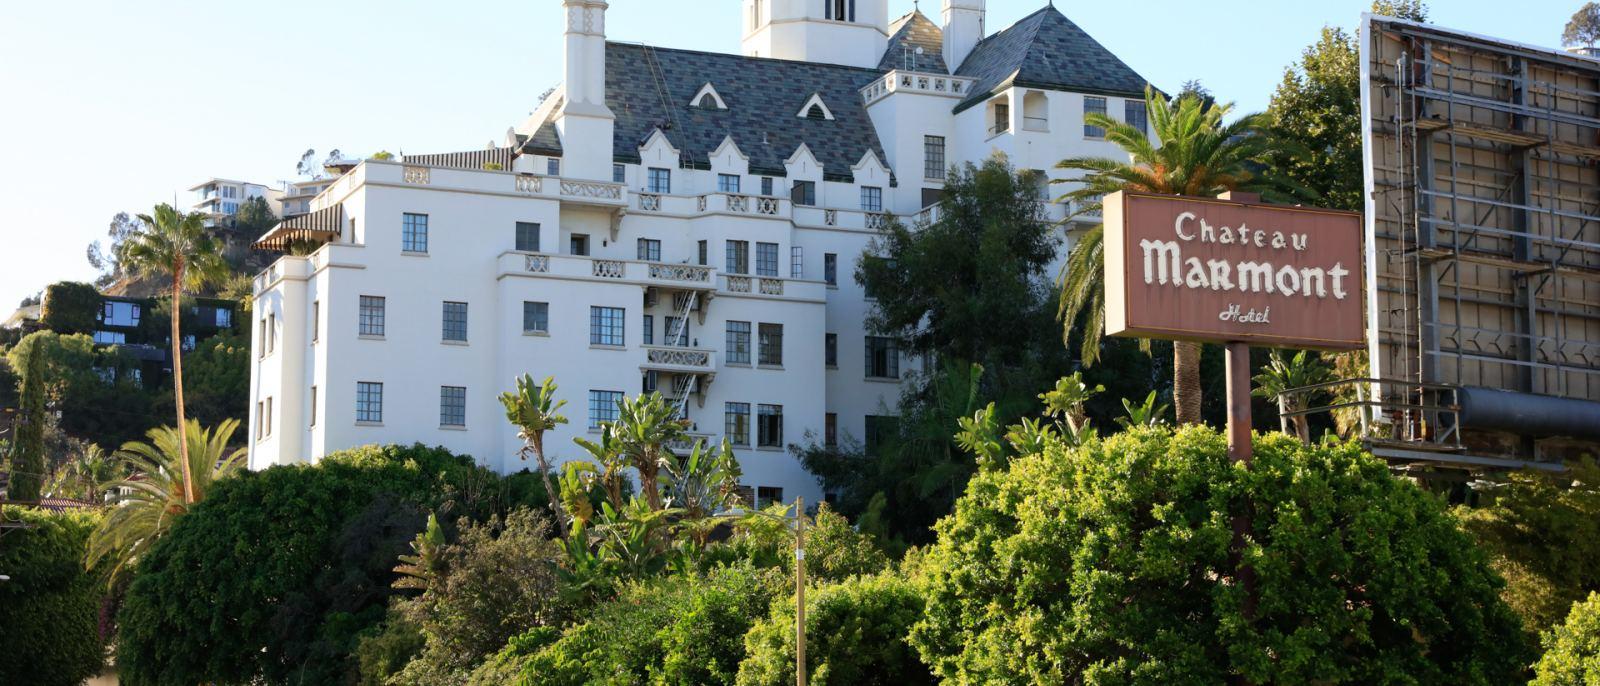 Chateau Marmont exterior